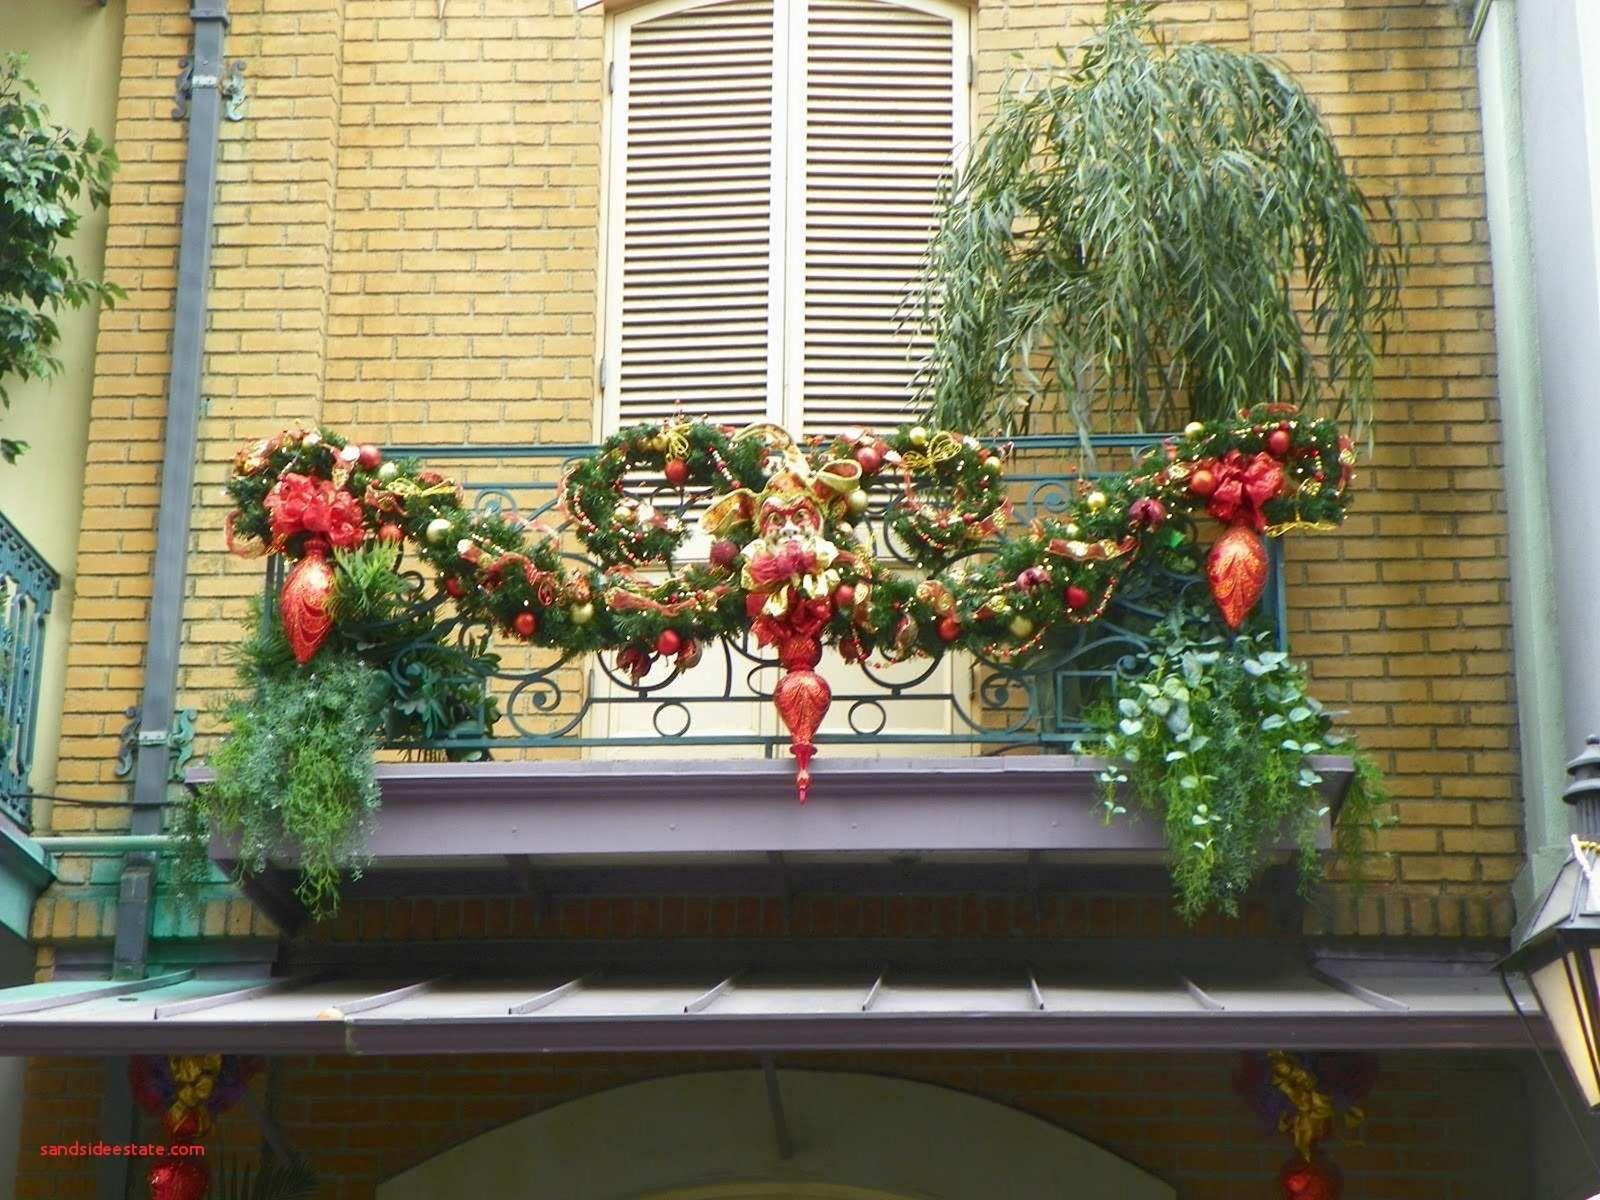 christmas lights decor balcony ideas christmas apartment decorating with christmas lights on christmas balcony decorations apartment patio id=11460